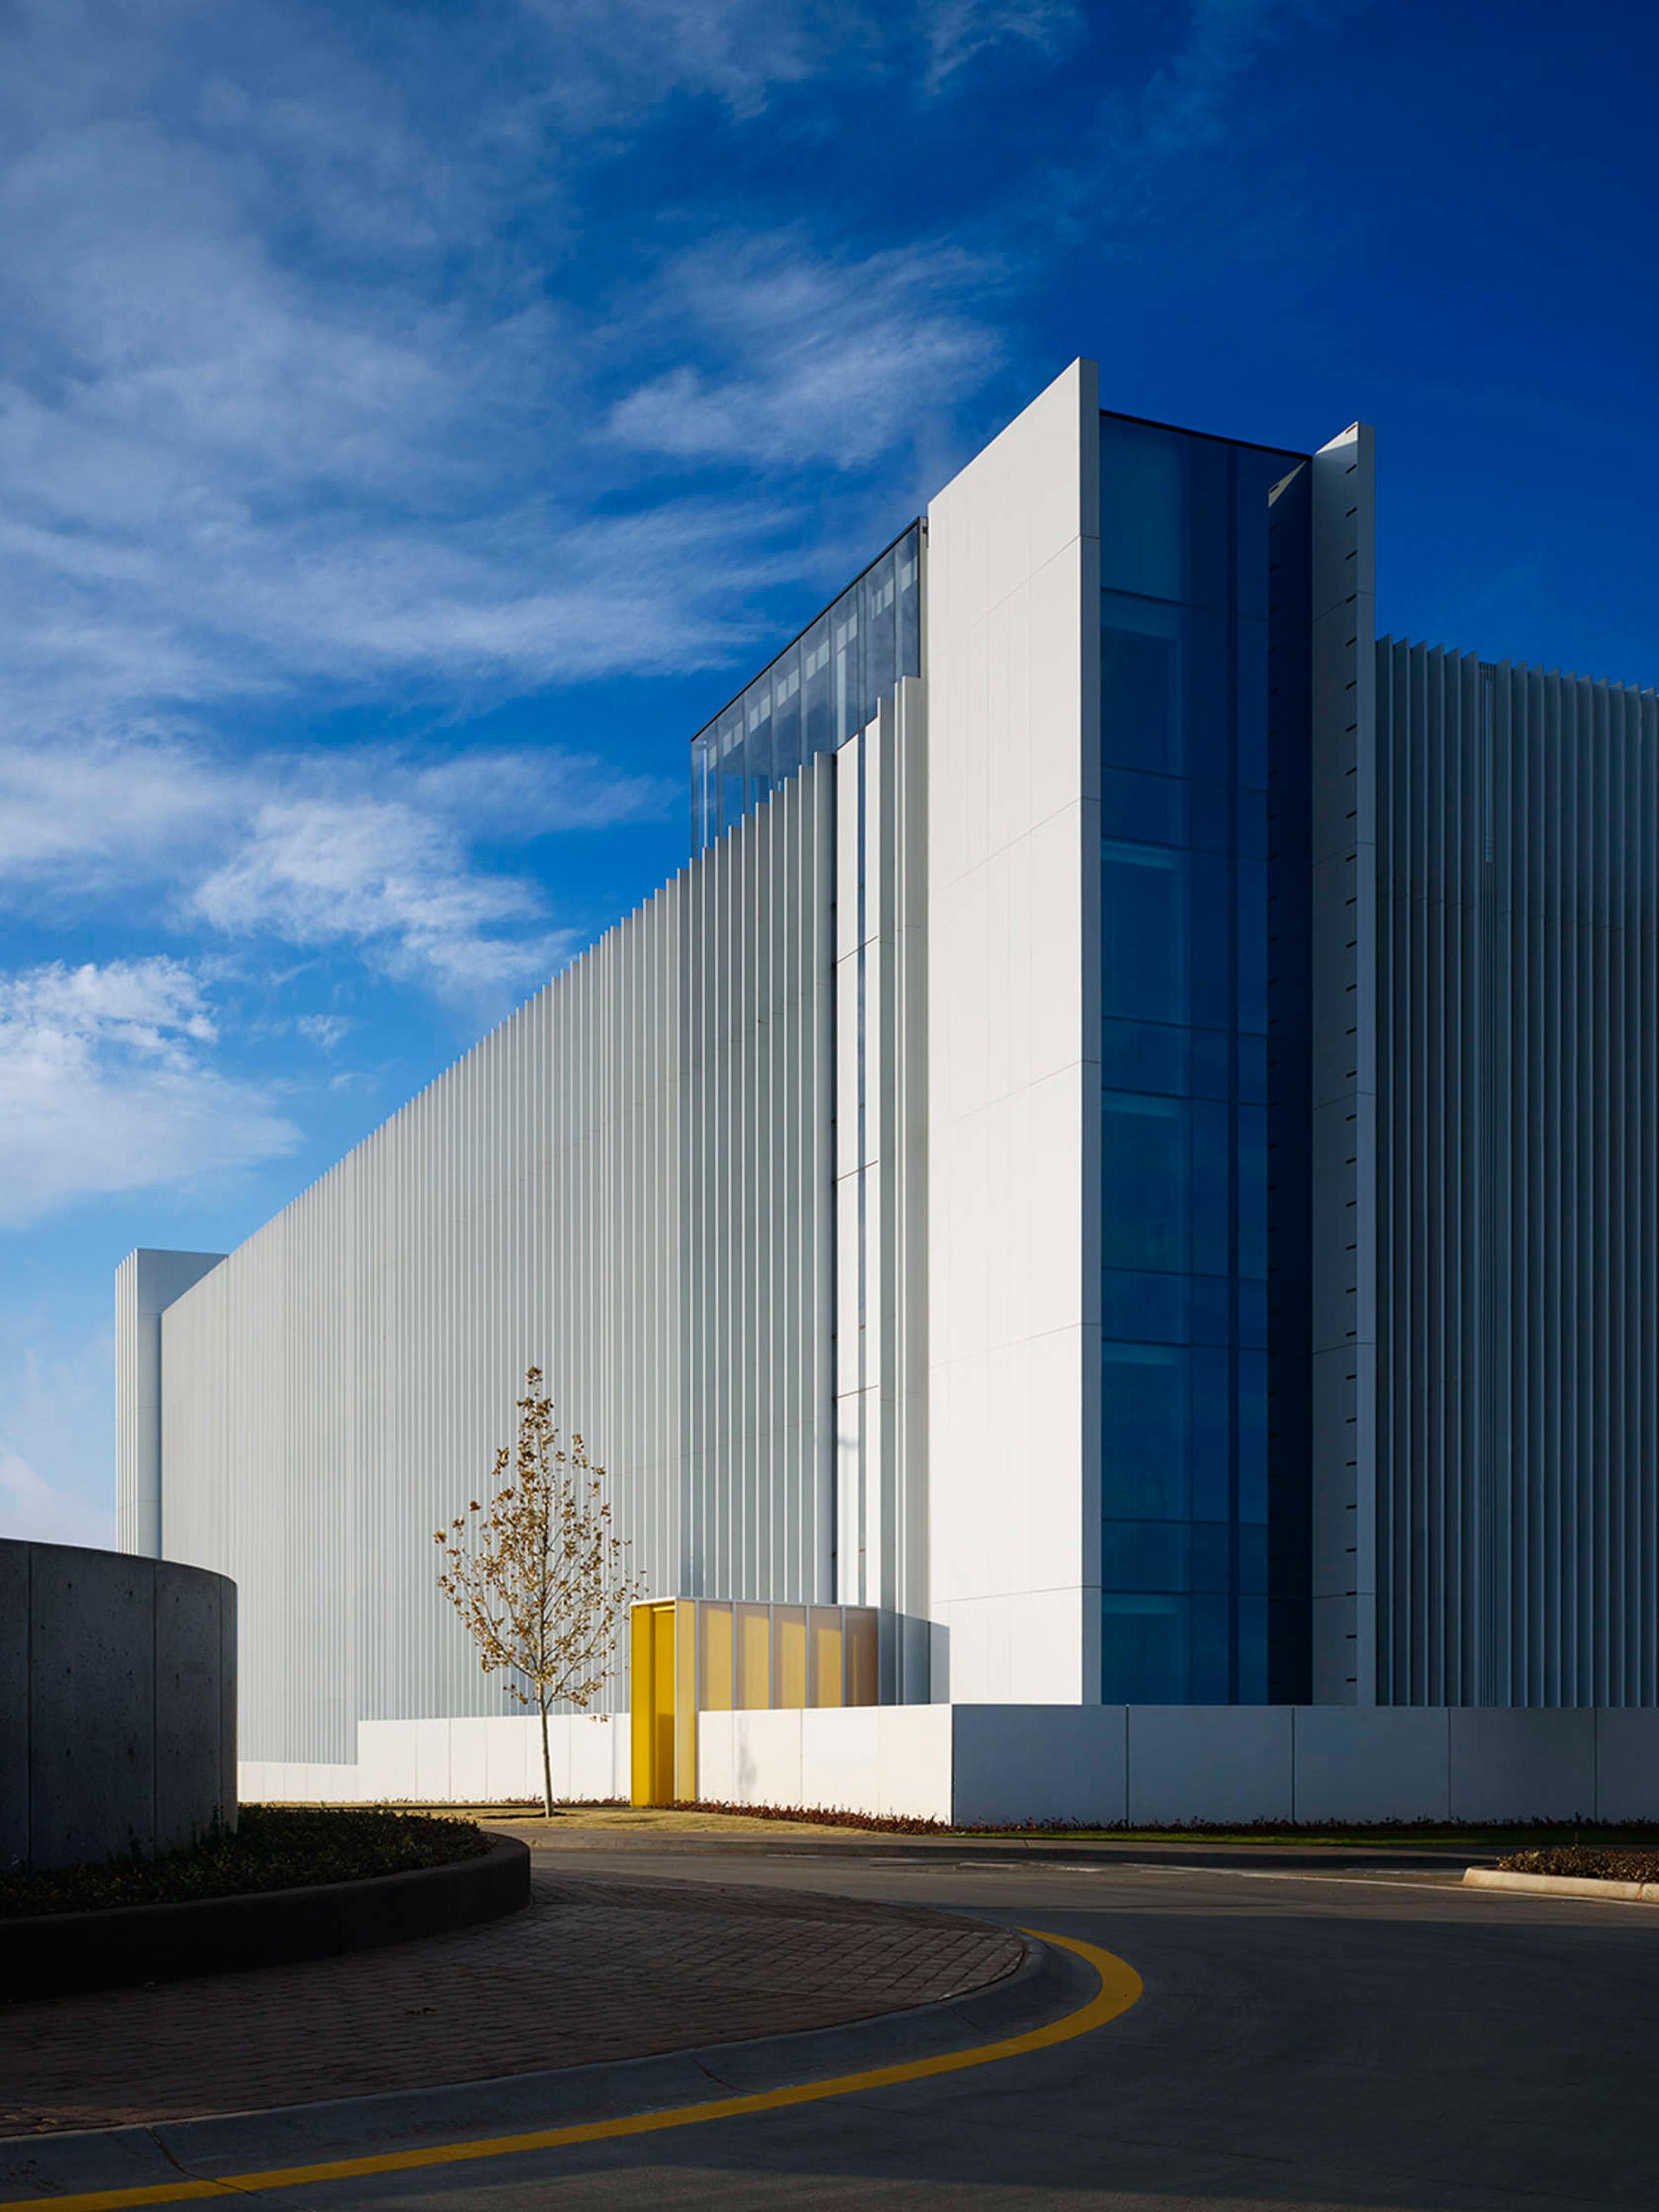 Elliott + Associates wraps Chesapeake car park in white fins